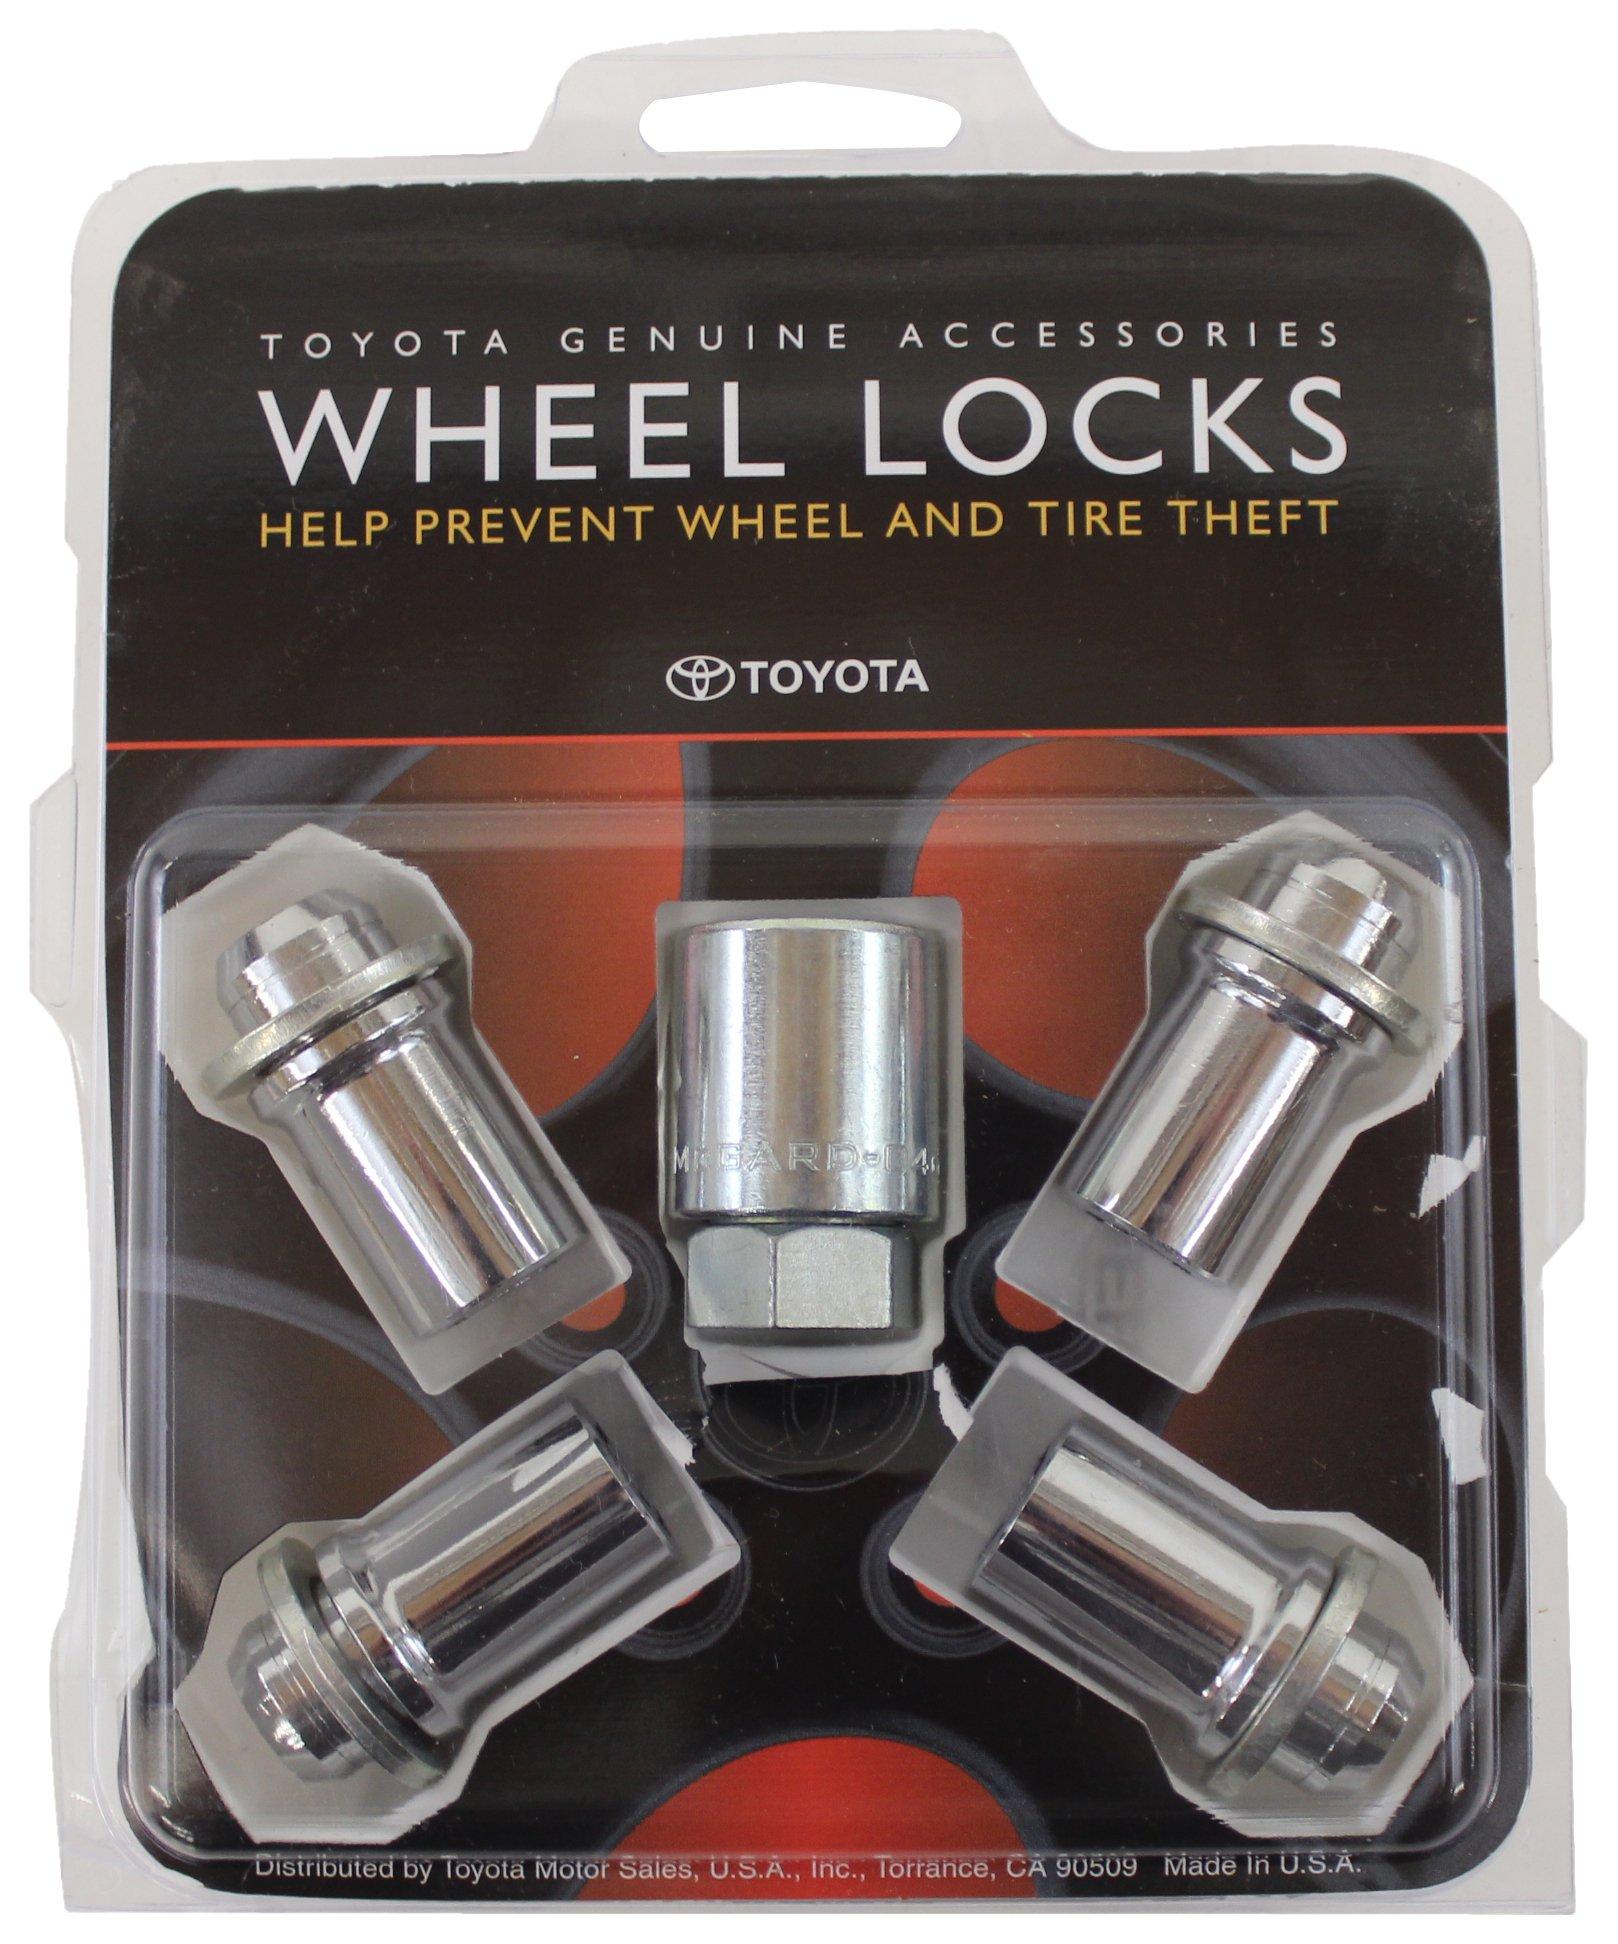 Genuine Toyota Accessories 00276-00901 Wheel Lock